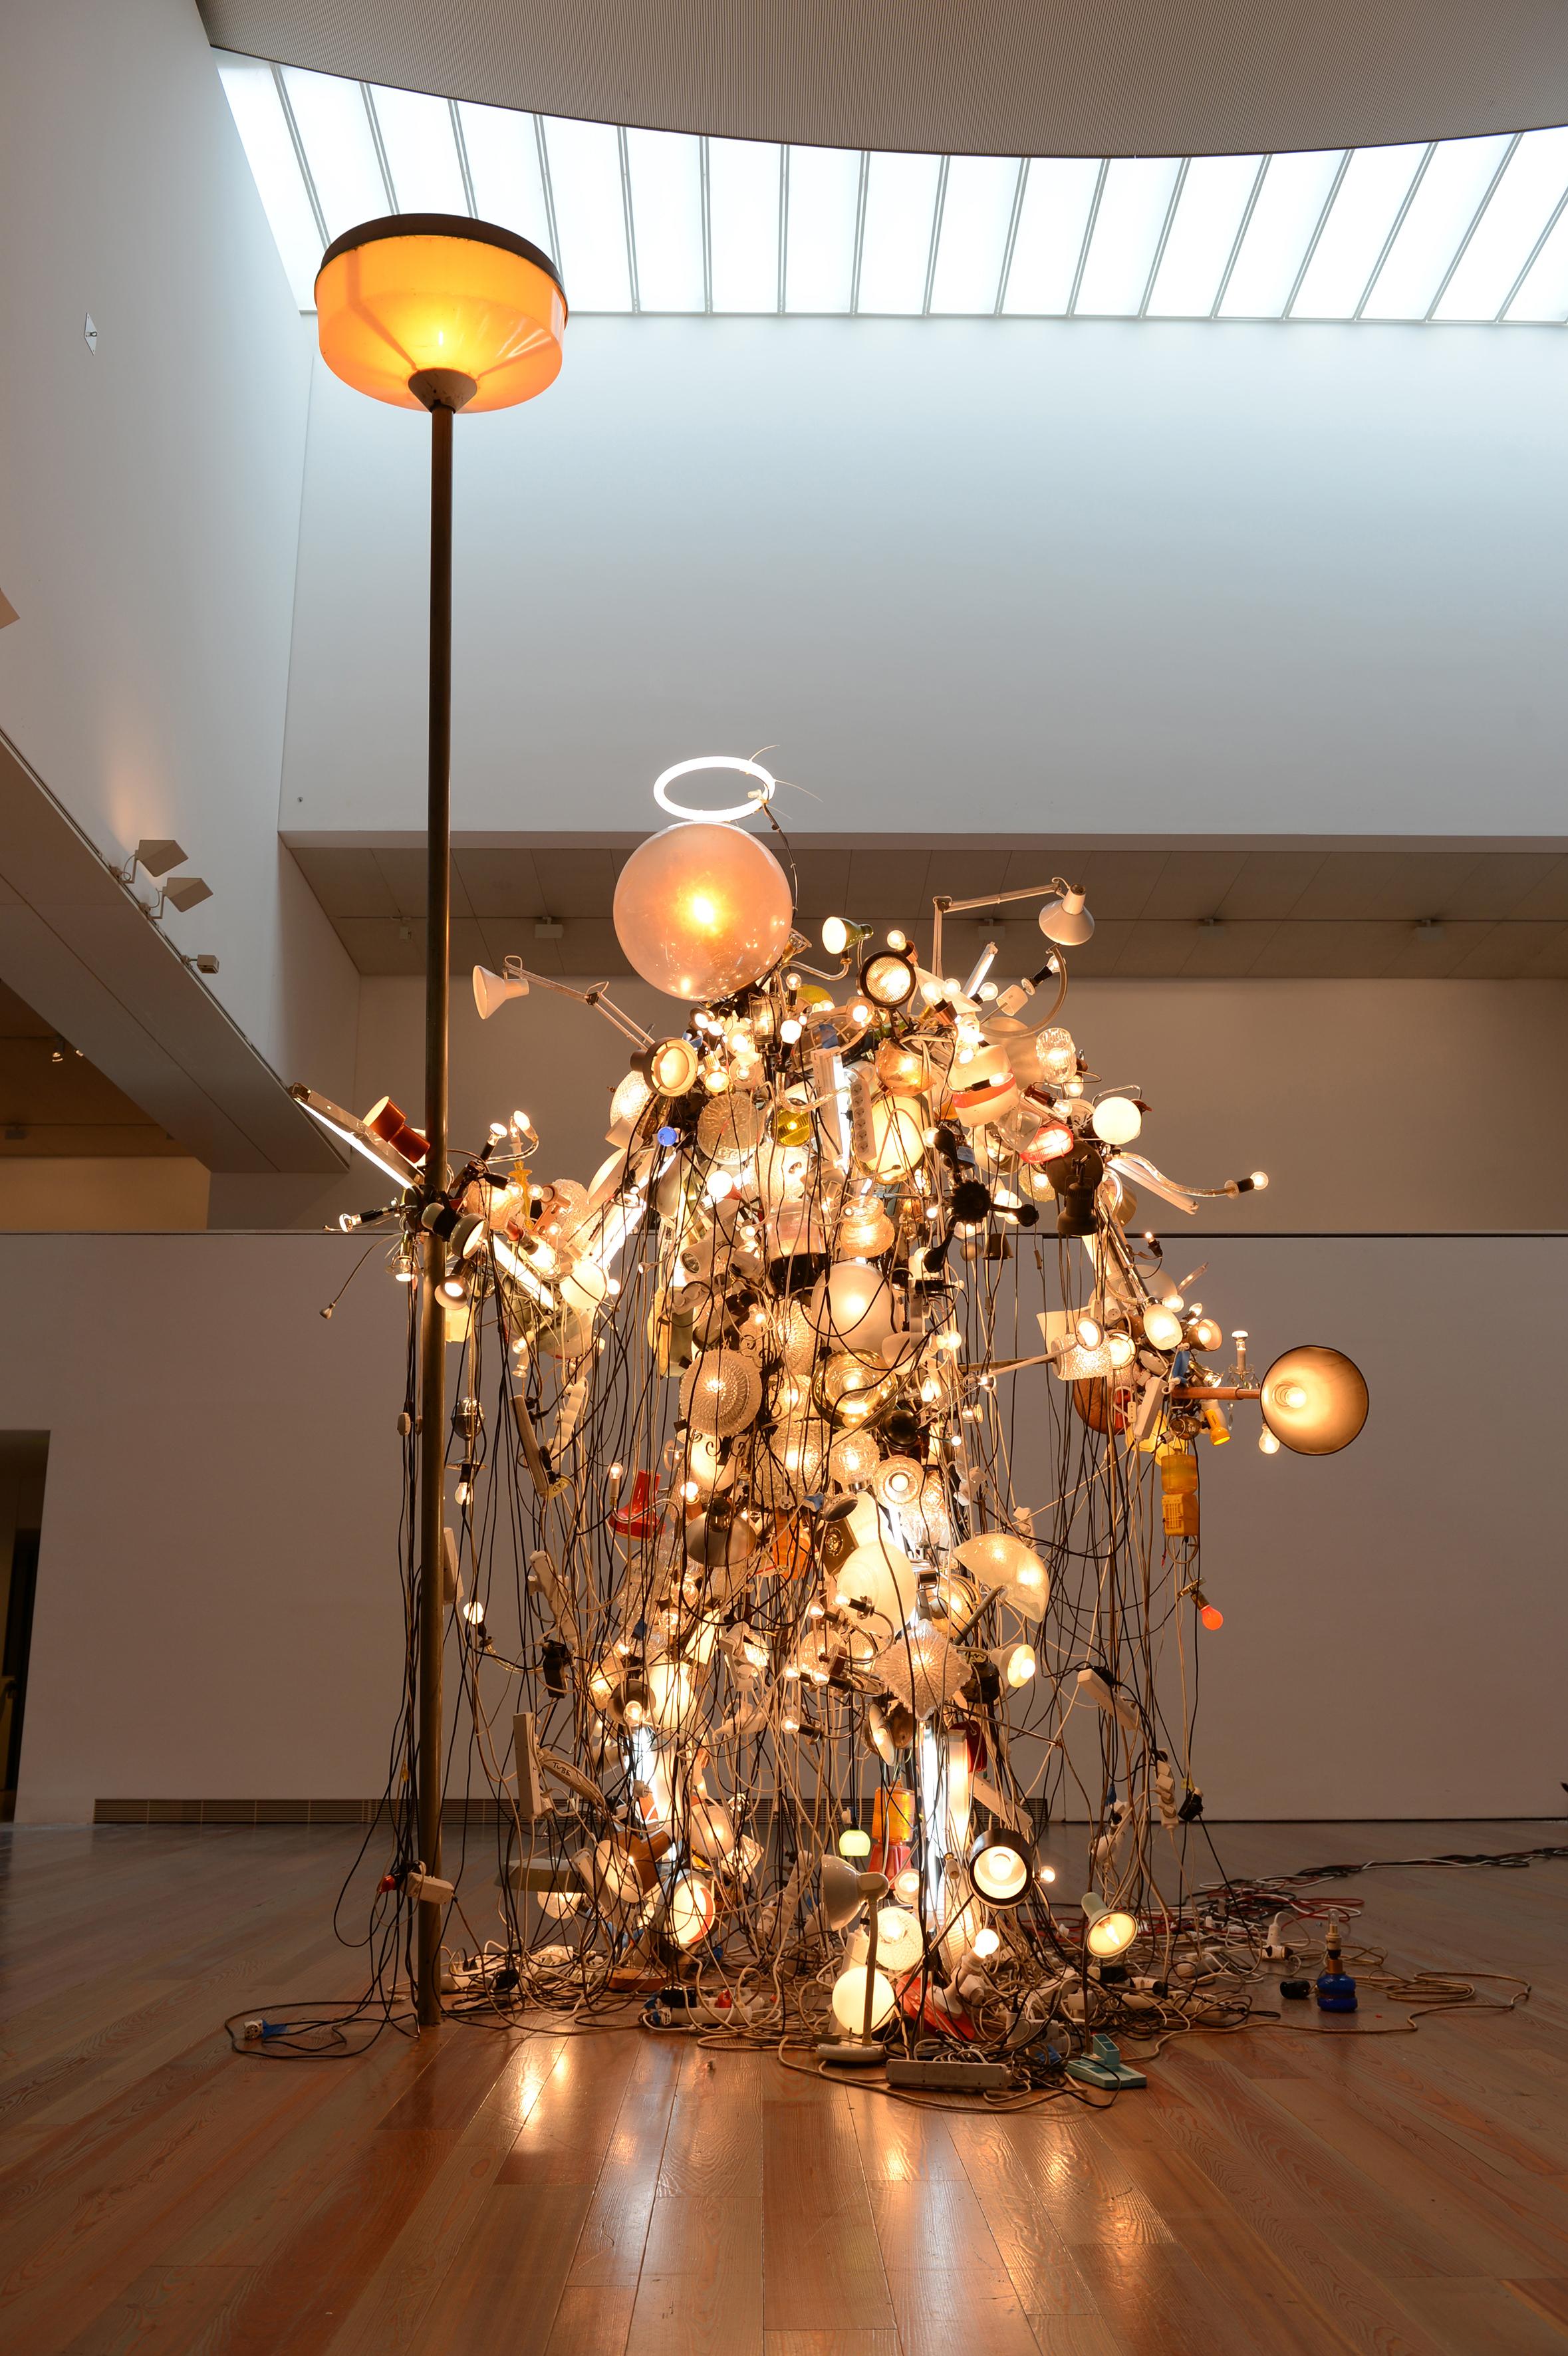 Golem aus Licht statt Lehm: «My light is your life – Shiva Samurai (5 KW / 50 HZ)» (2014).